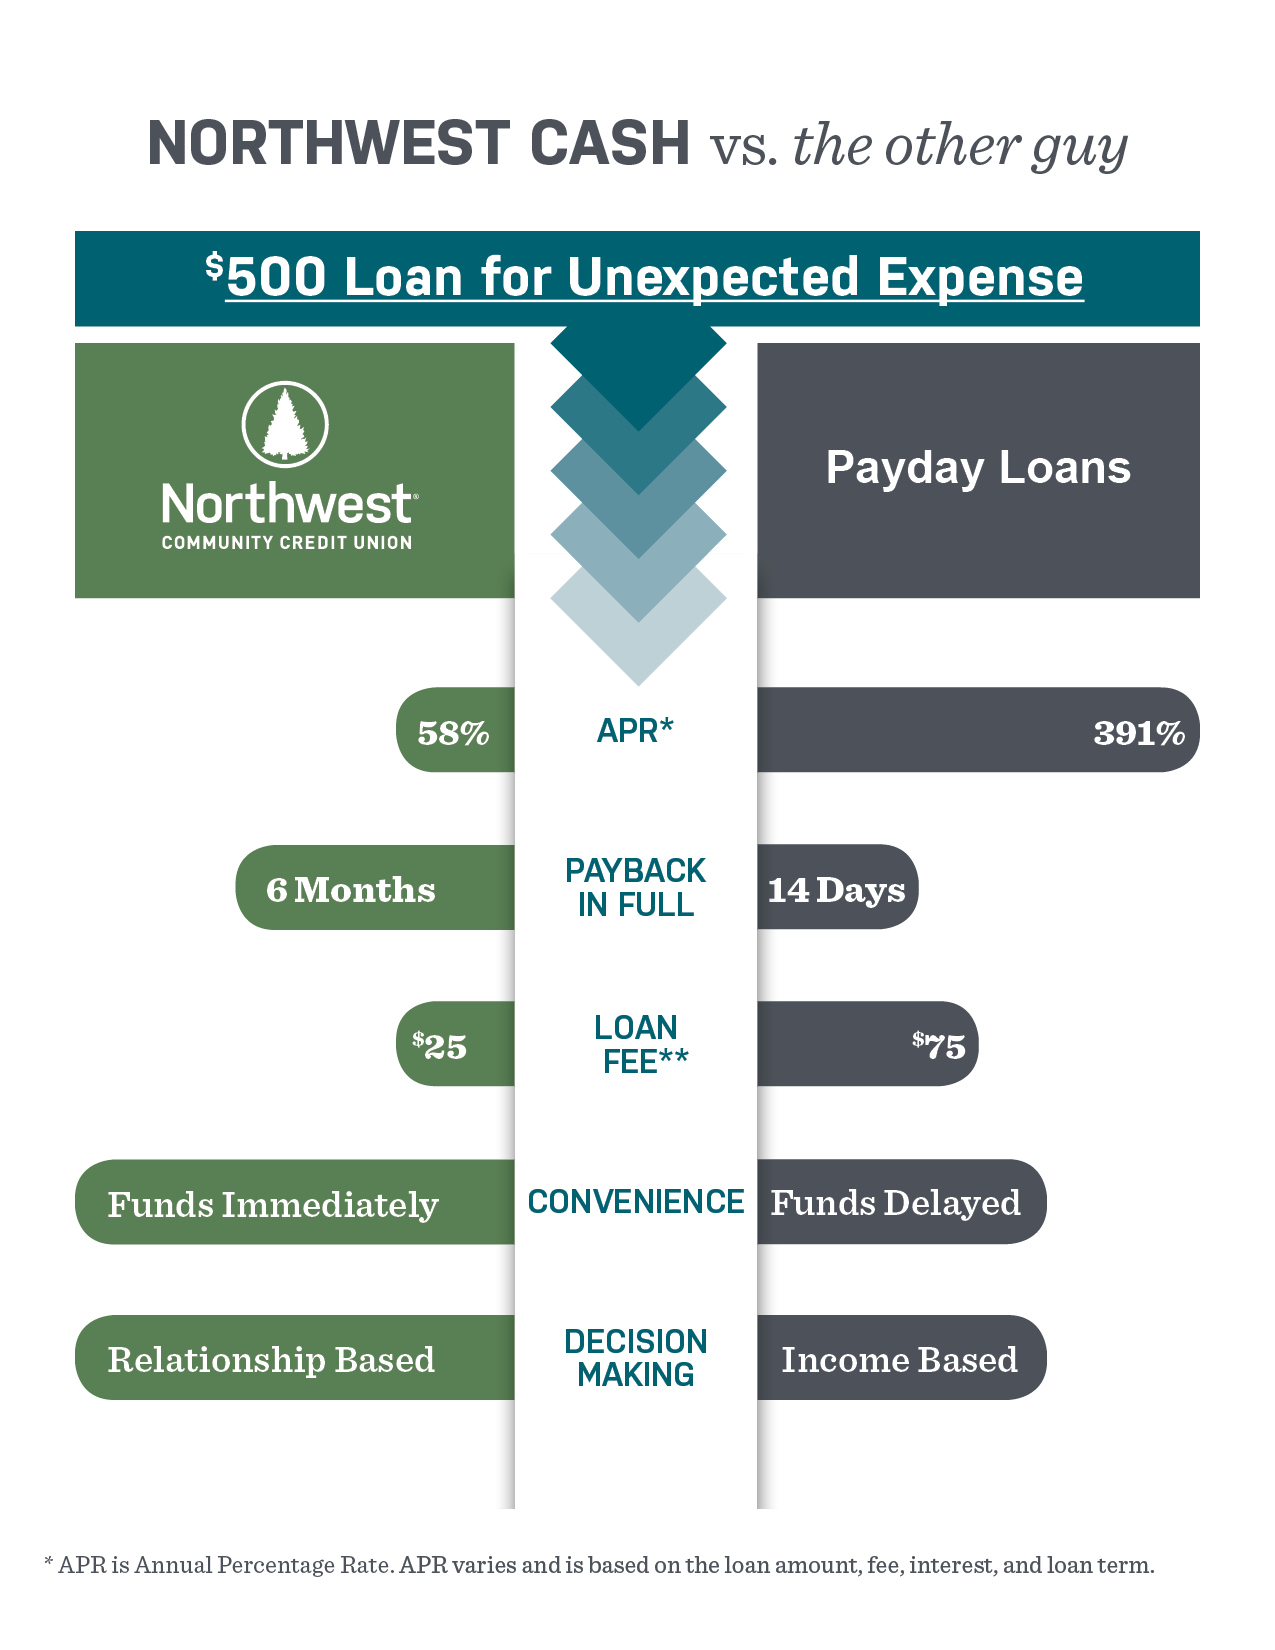 Northwest Cash loan versus Payday loan